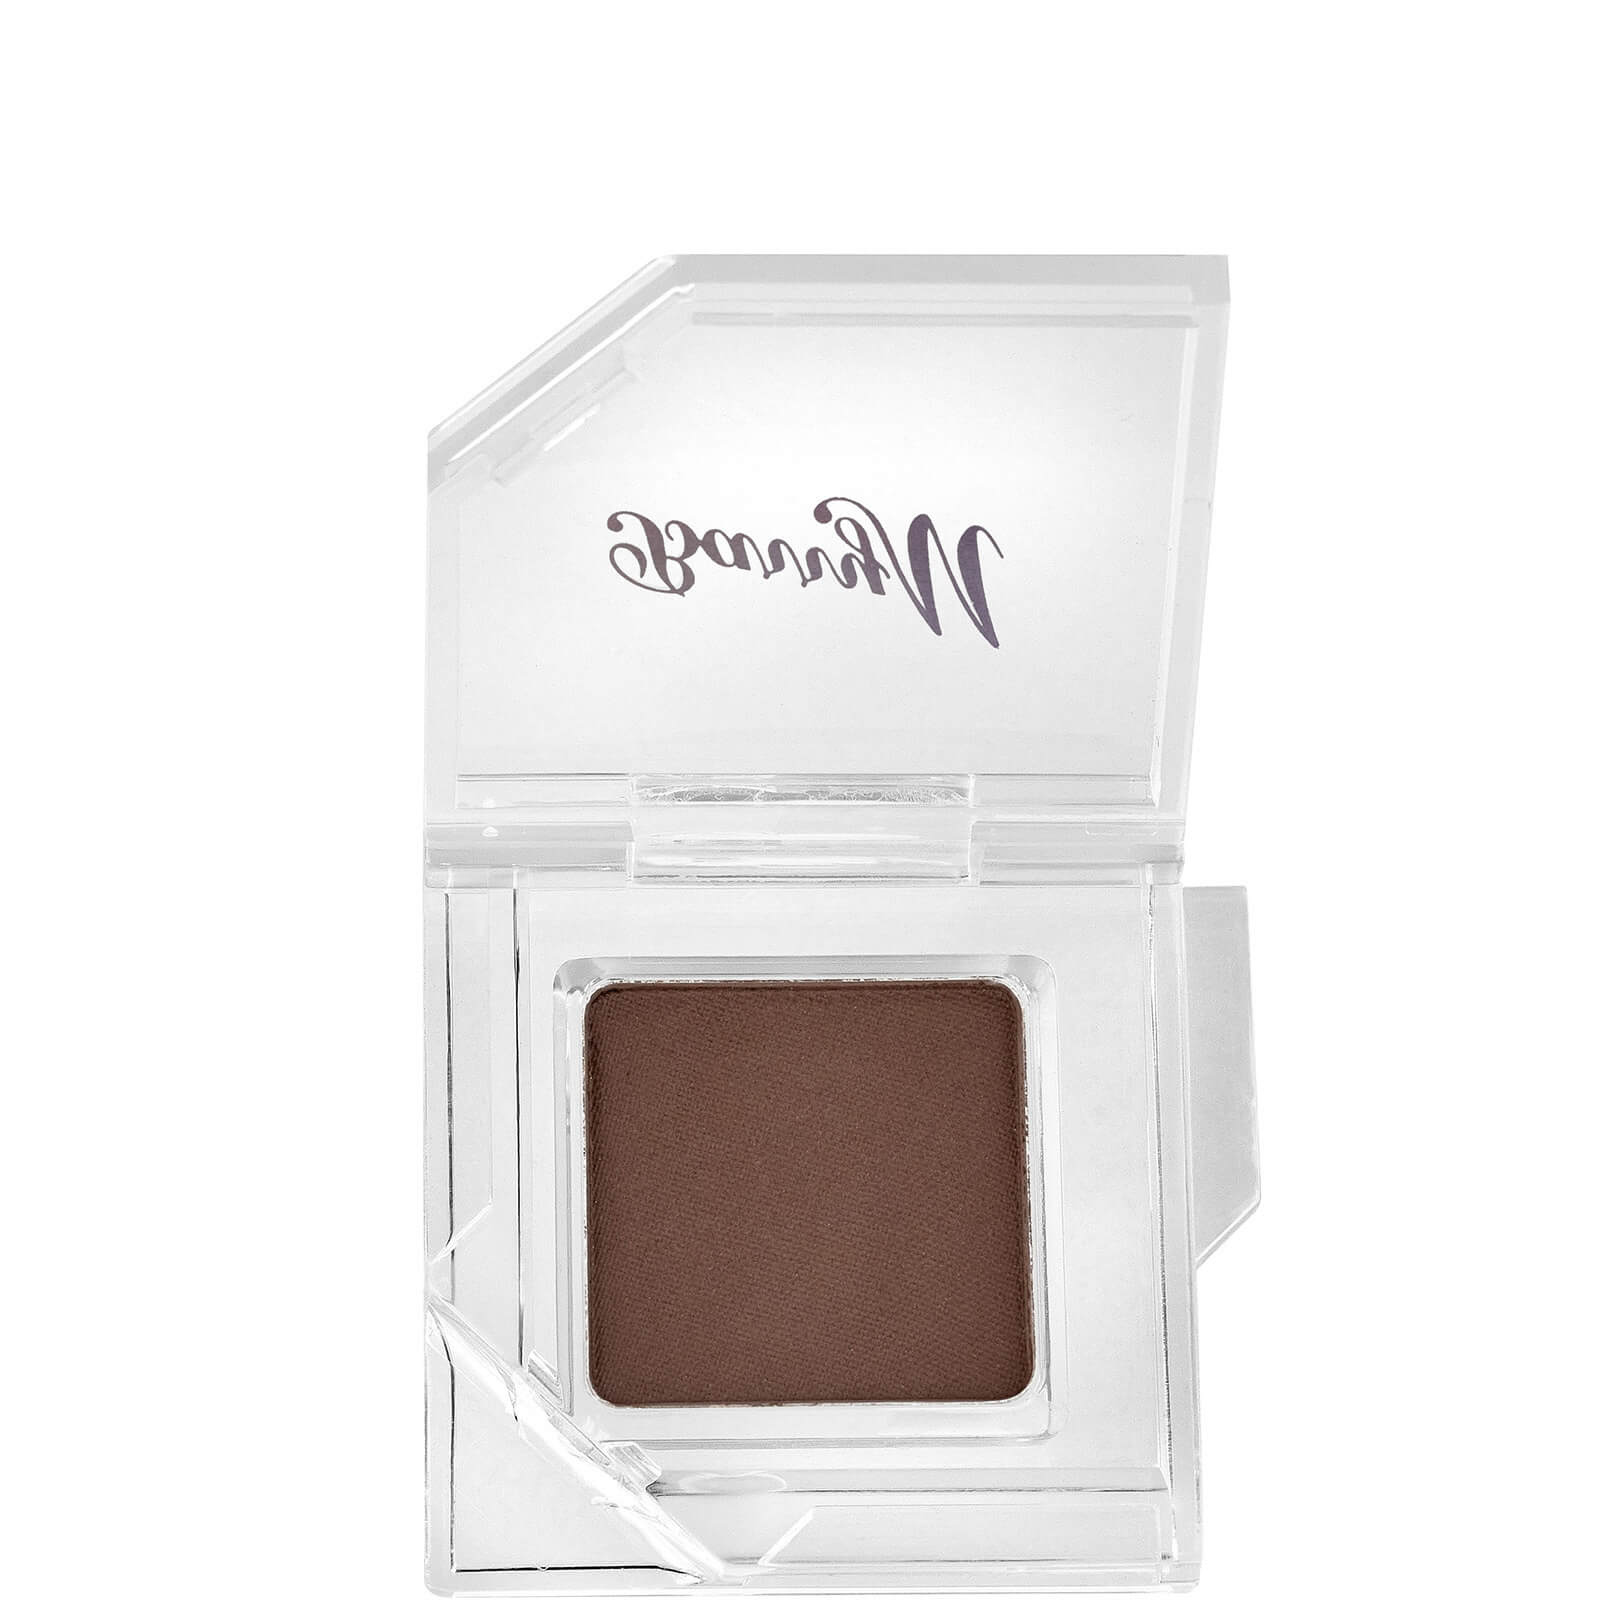 Купить Barry M Cosmetics Clickable Eyeshadow 3.78g (Various Shades) - Tempting